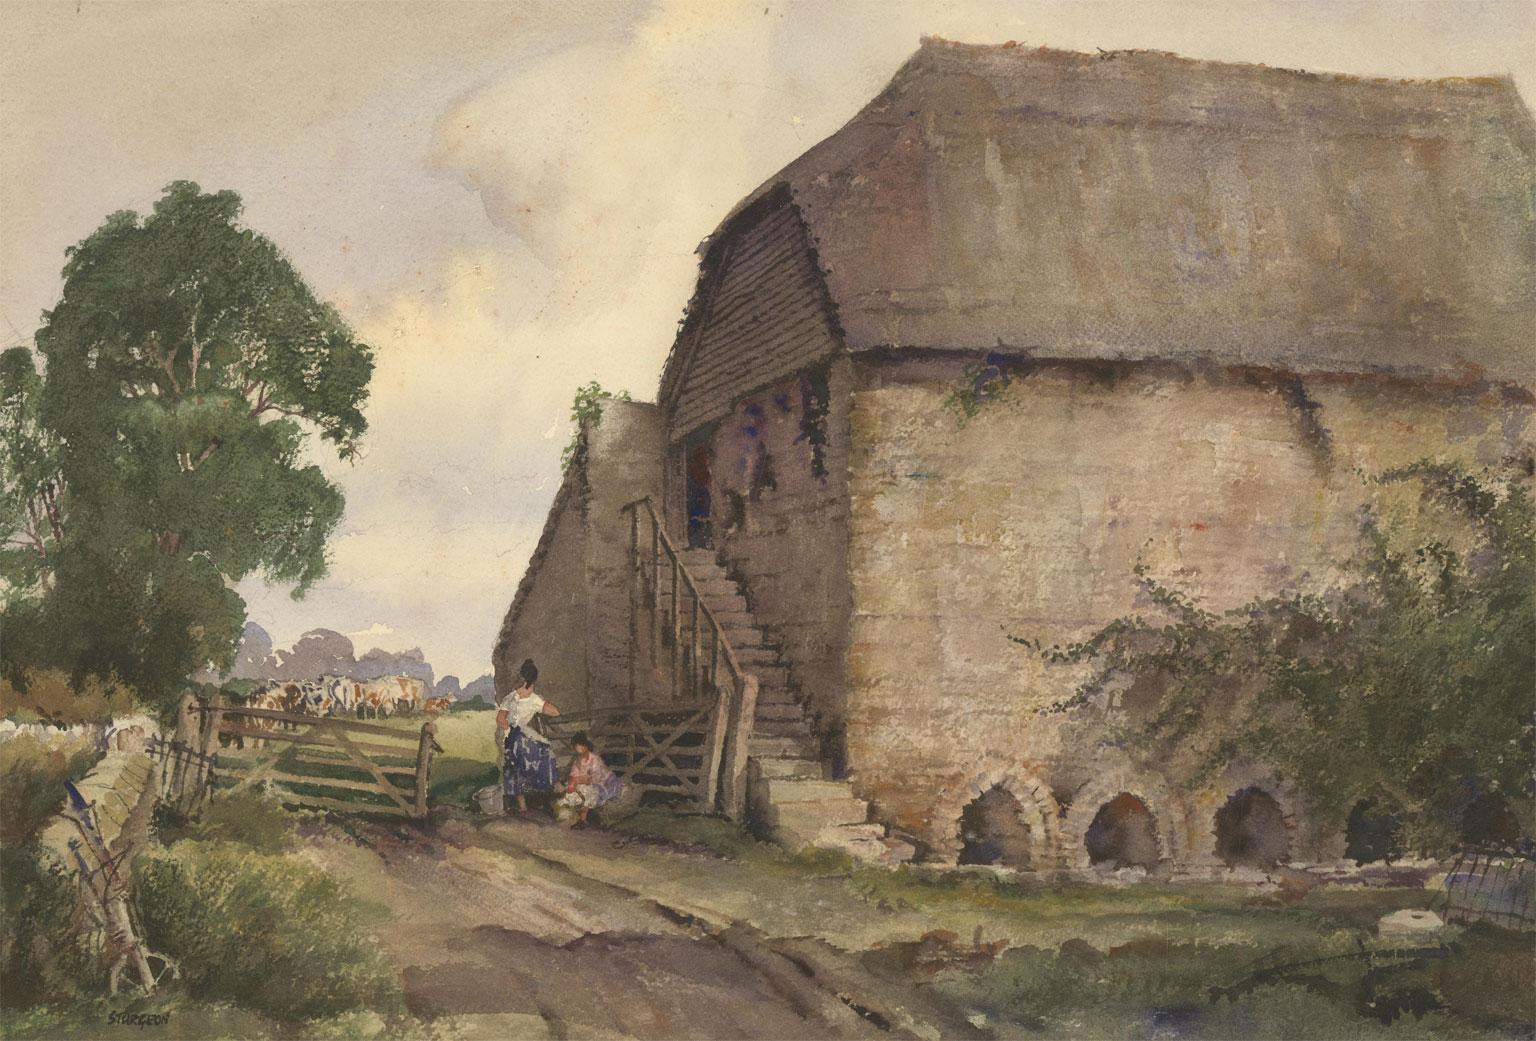 Eric Richard Sturgeon (1920-1999)  - 20th Century Watercolour, The Dairy Farm